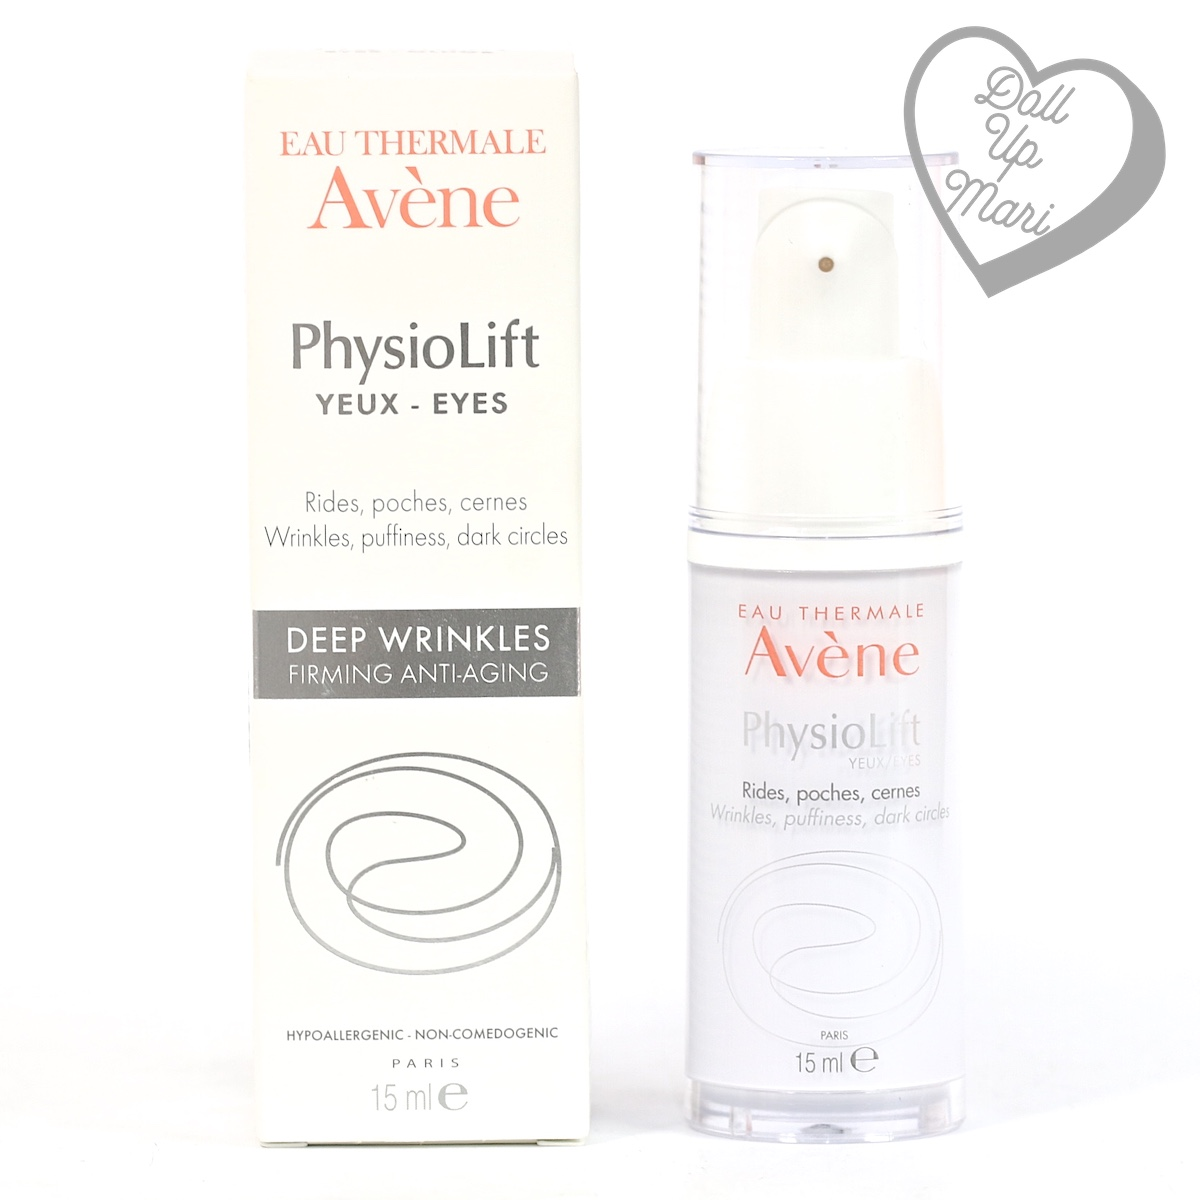 pack shot of Avène PhysioLift Eye Contour Cream